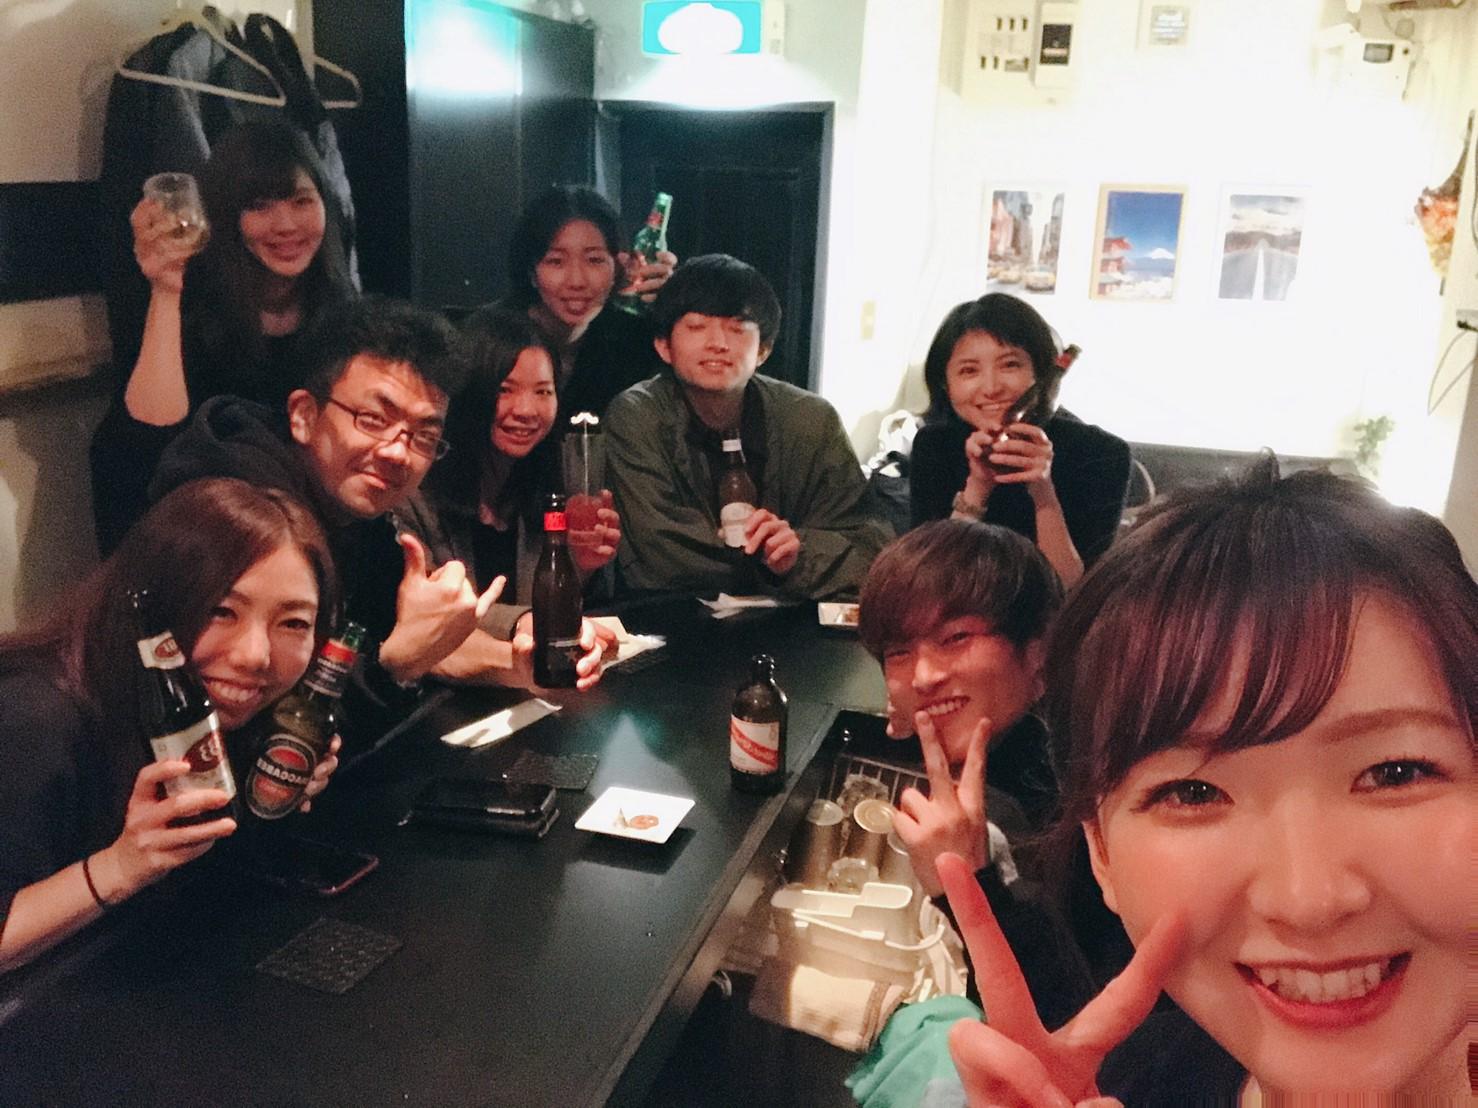 xaricadeに行ってみた。【名古屋栄の女性バーテンダー店「シャリケードバー」】【感想口コミ・評価】